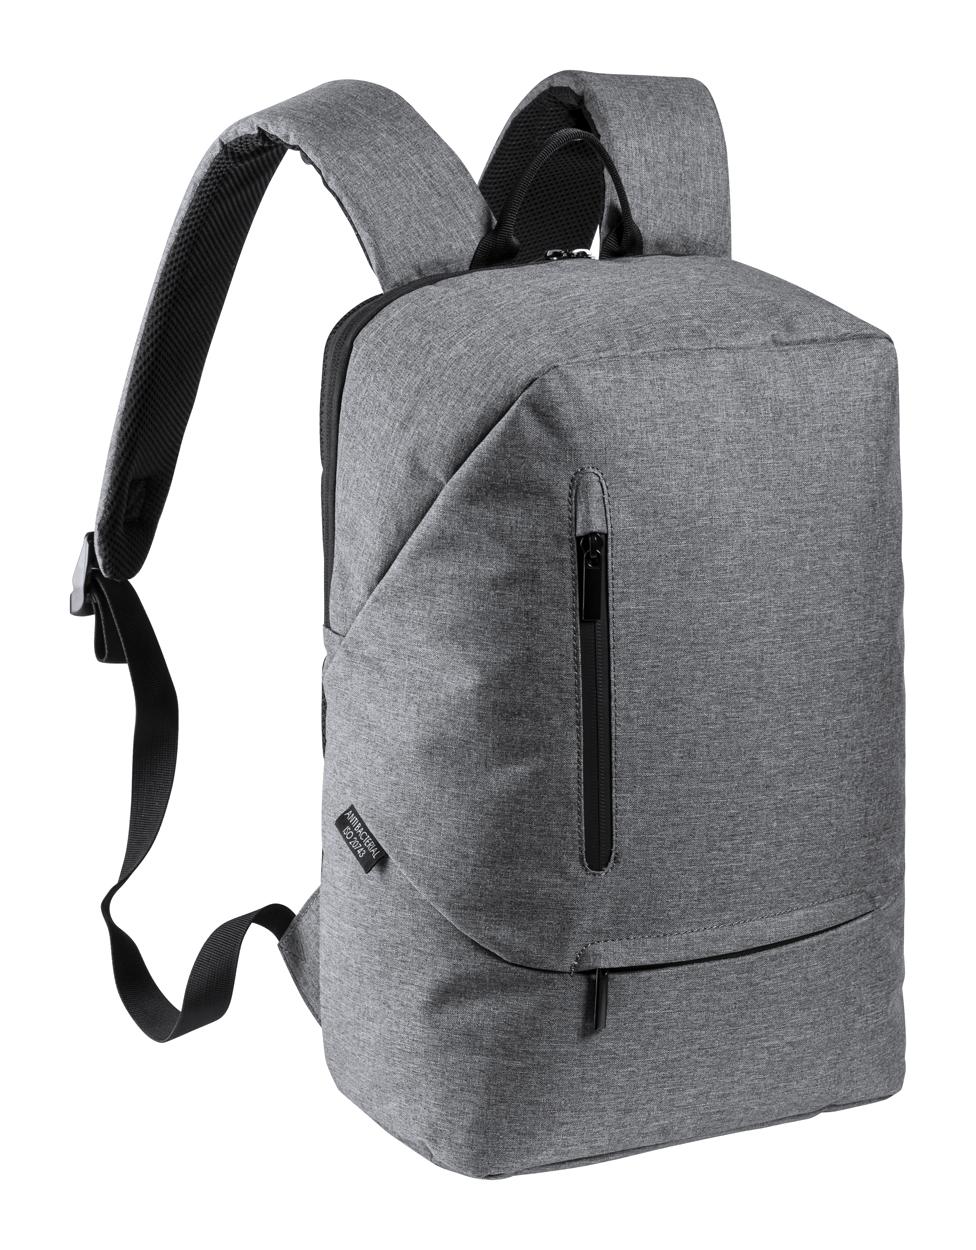 Mordux anti-bacterial backpack